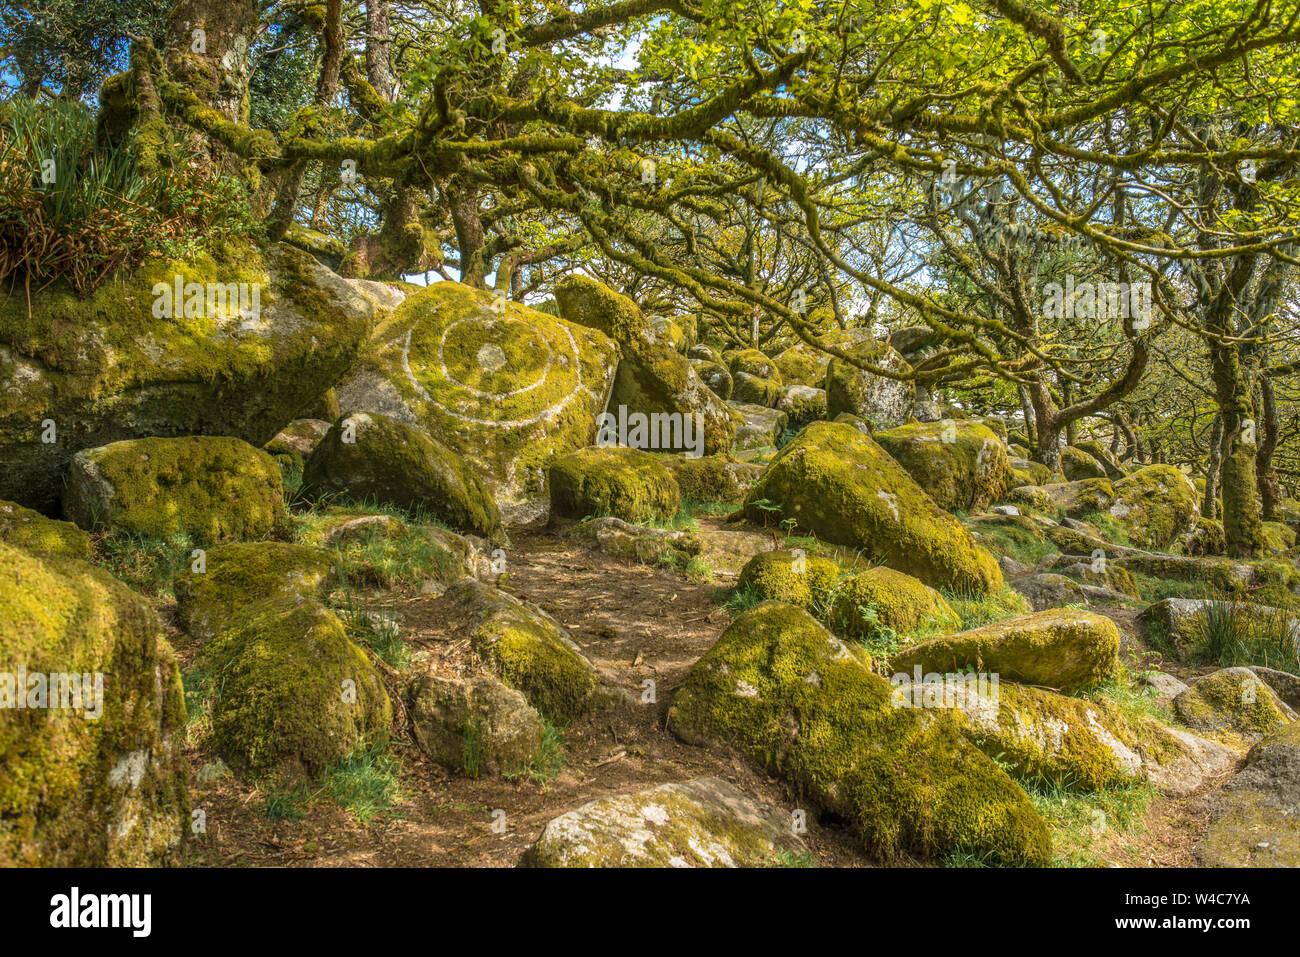 Sessile oaks and moss in Wistman's Wood Dartmoor Devon England UK GB British Isles Stock Photo